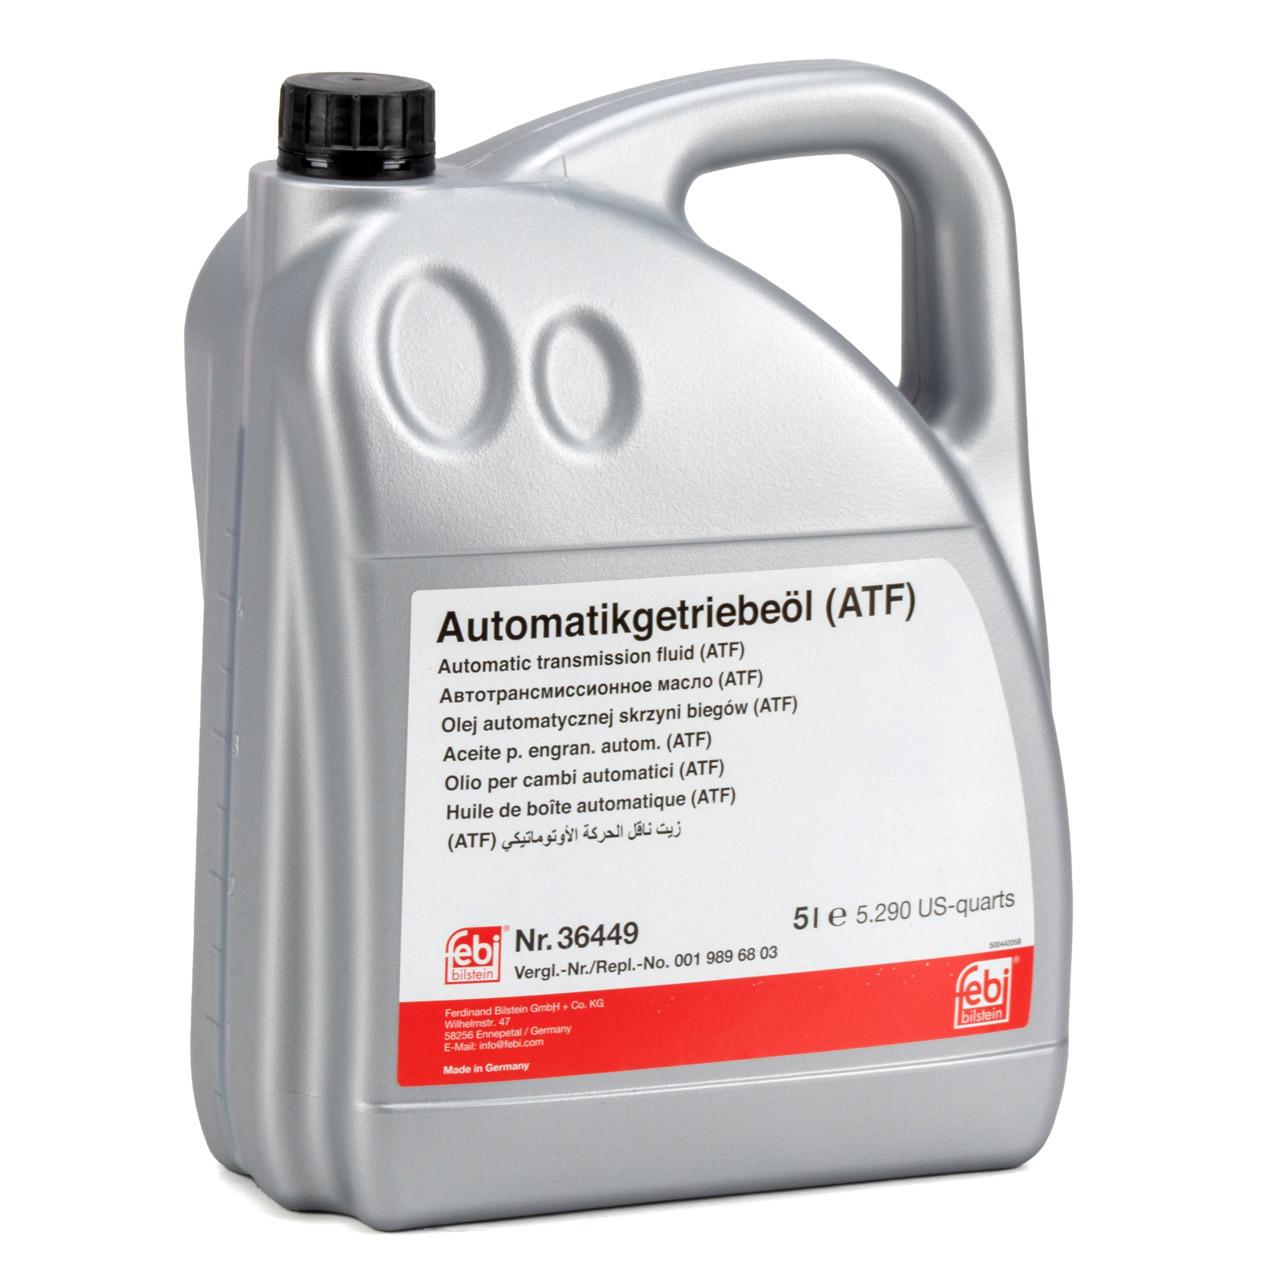 FEBI 36449 Automatikgetriebeöl ATF 134 MERCEDES MB 236.14 DSIH 6P805 5L 5 Liter